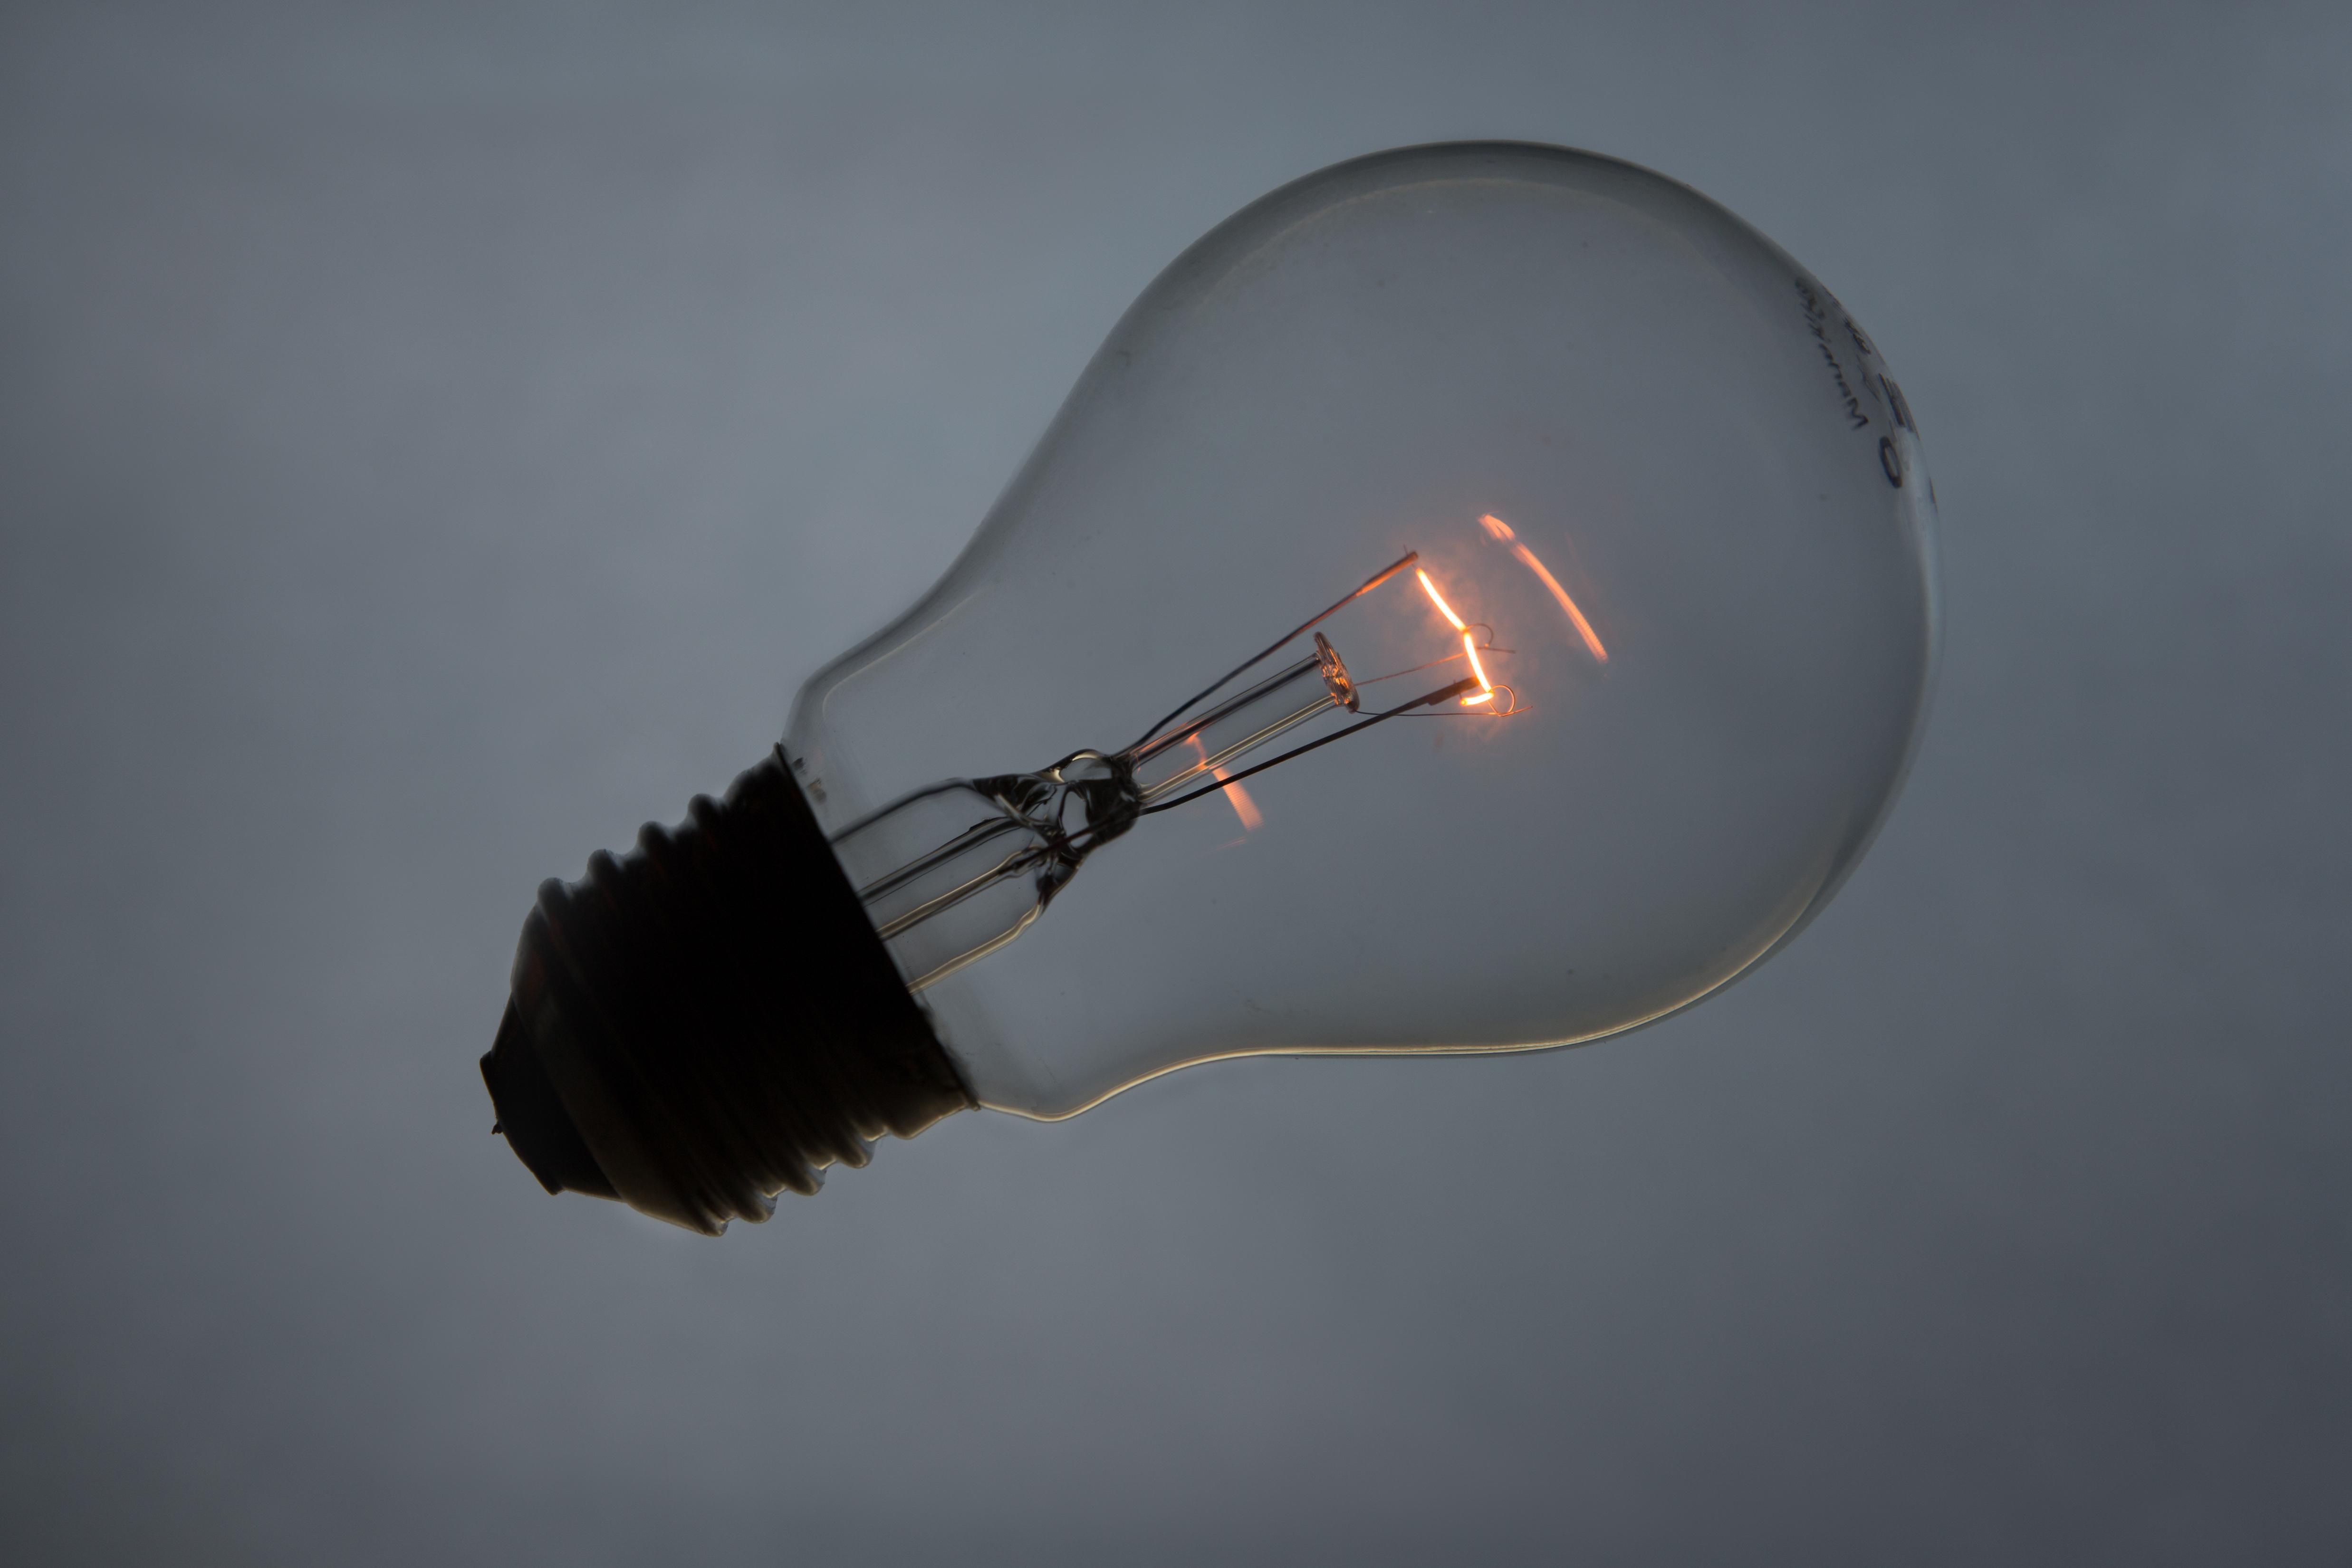 Картинки с лампой накаливания